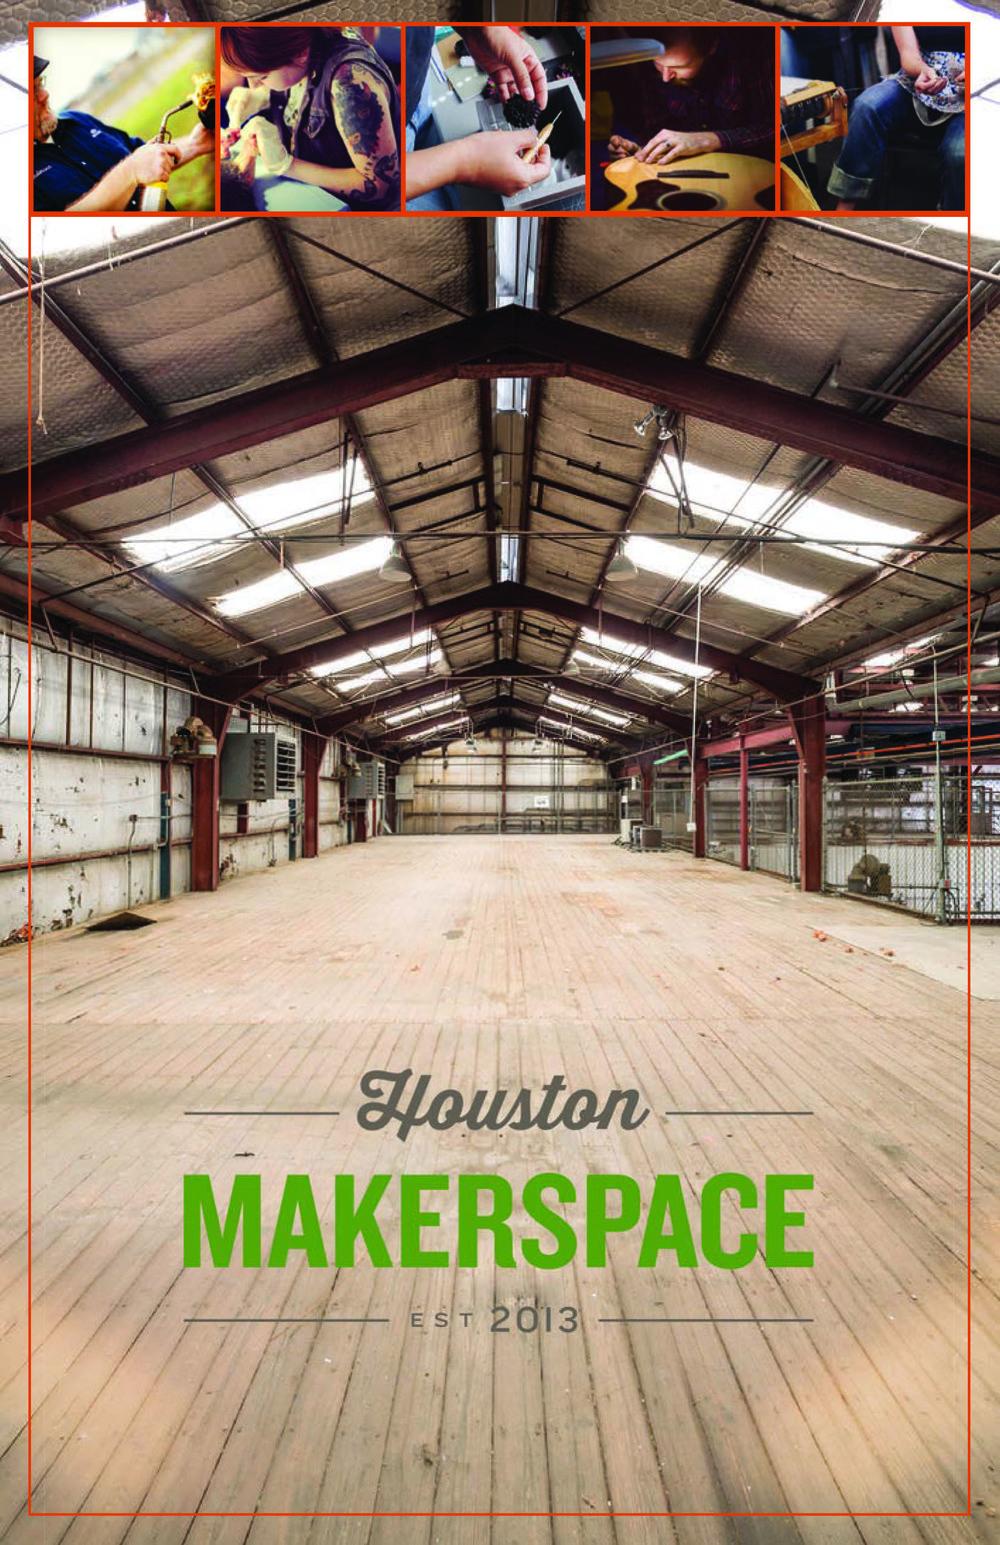 MakerspaceSponsorshipFlyer_Front.jpg